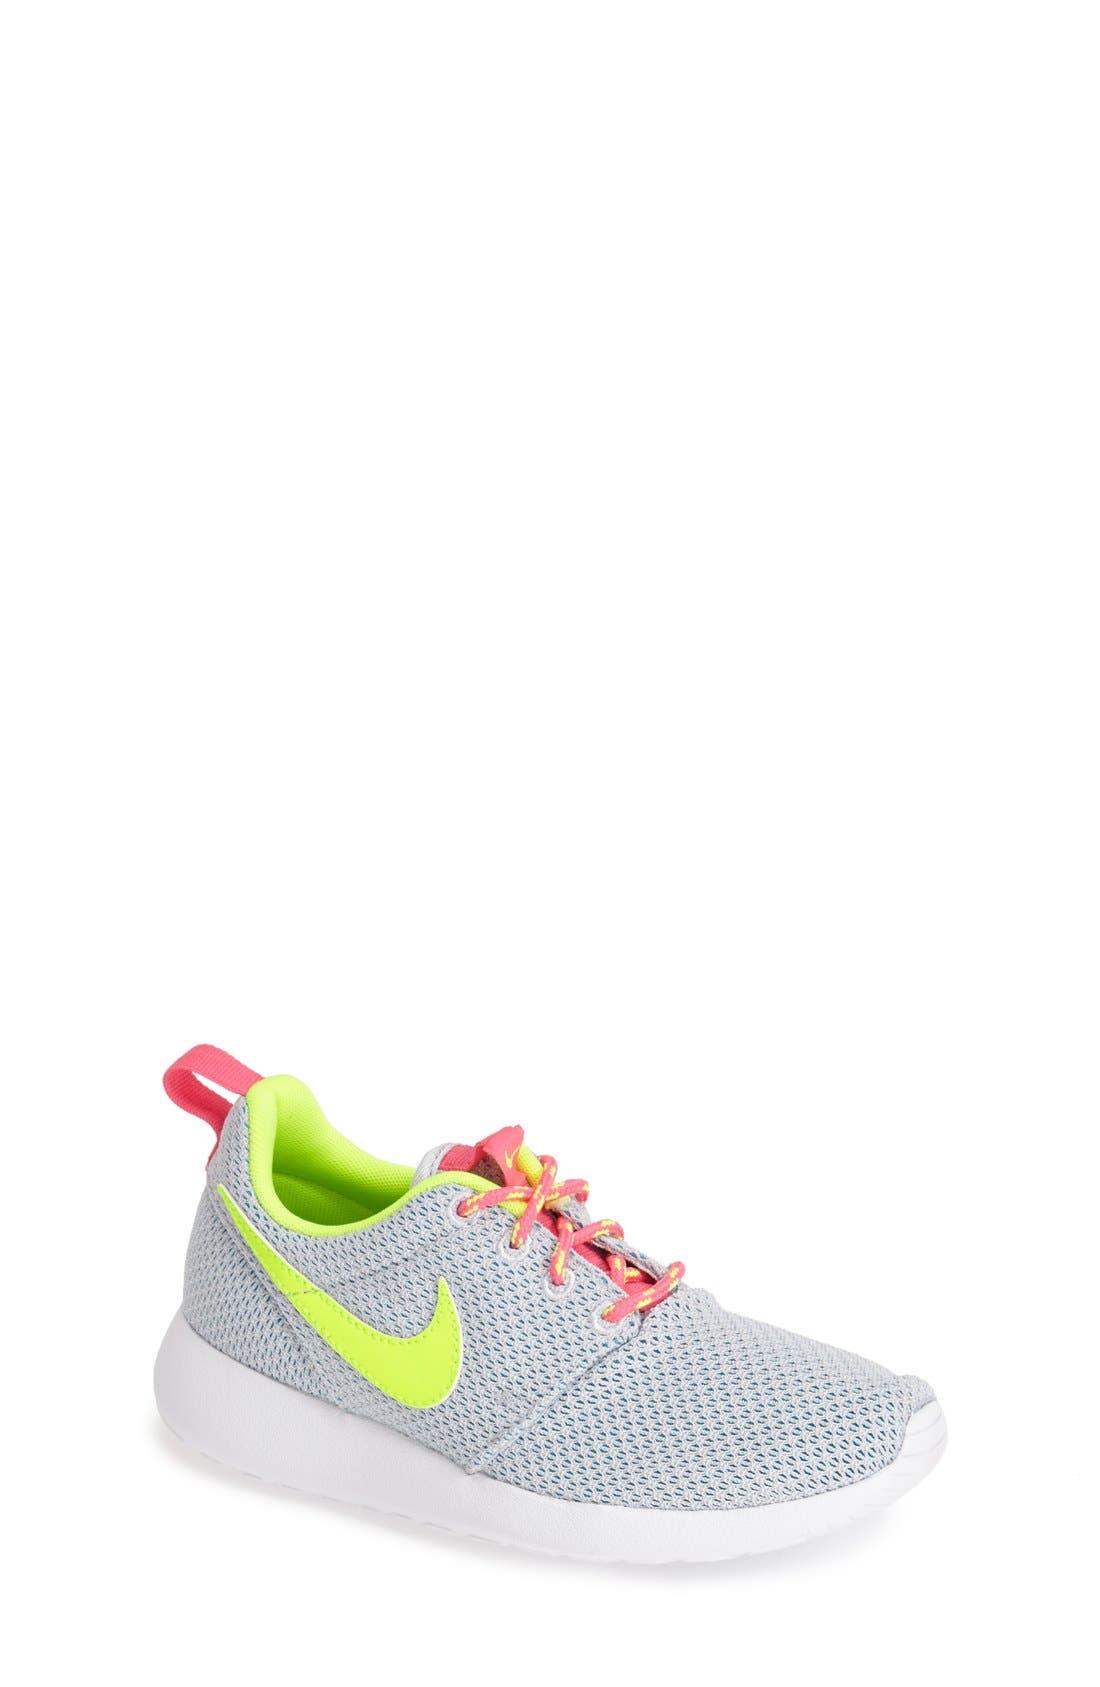 'Roshe Run' Athletic Shoe,                             Main thumbnail 22, color,